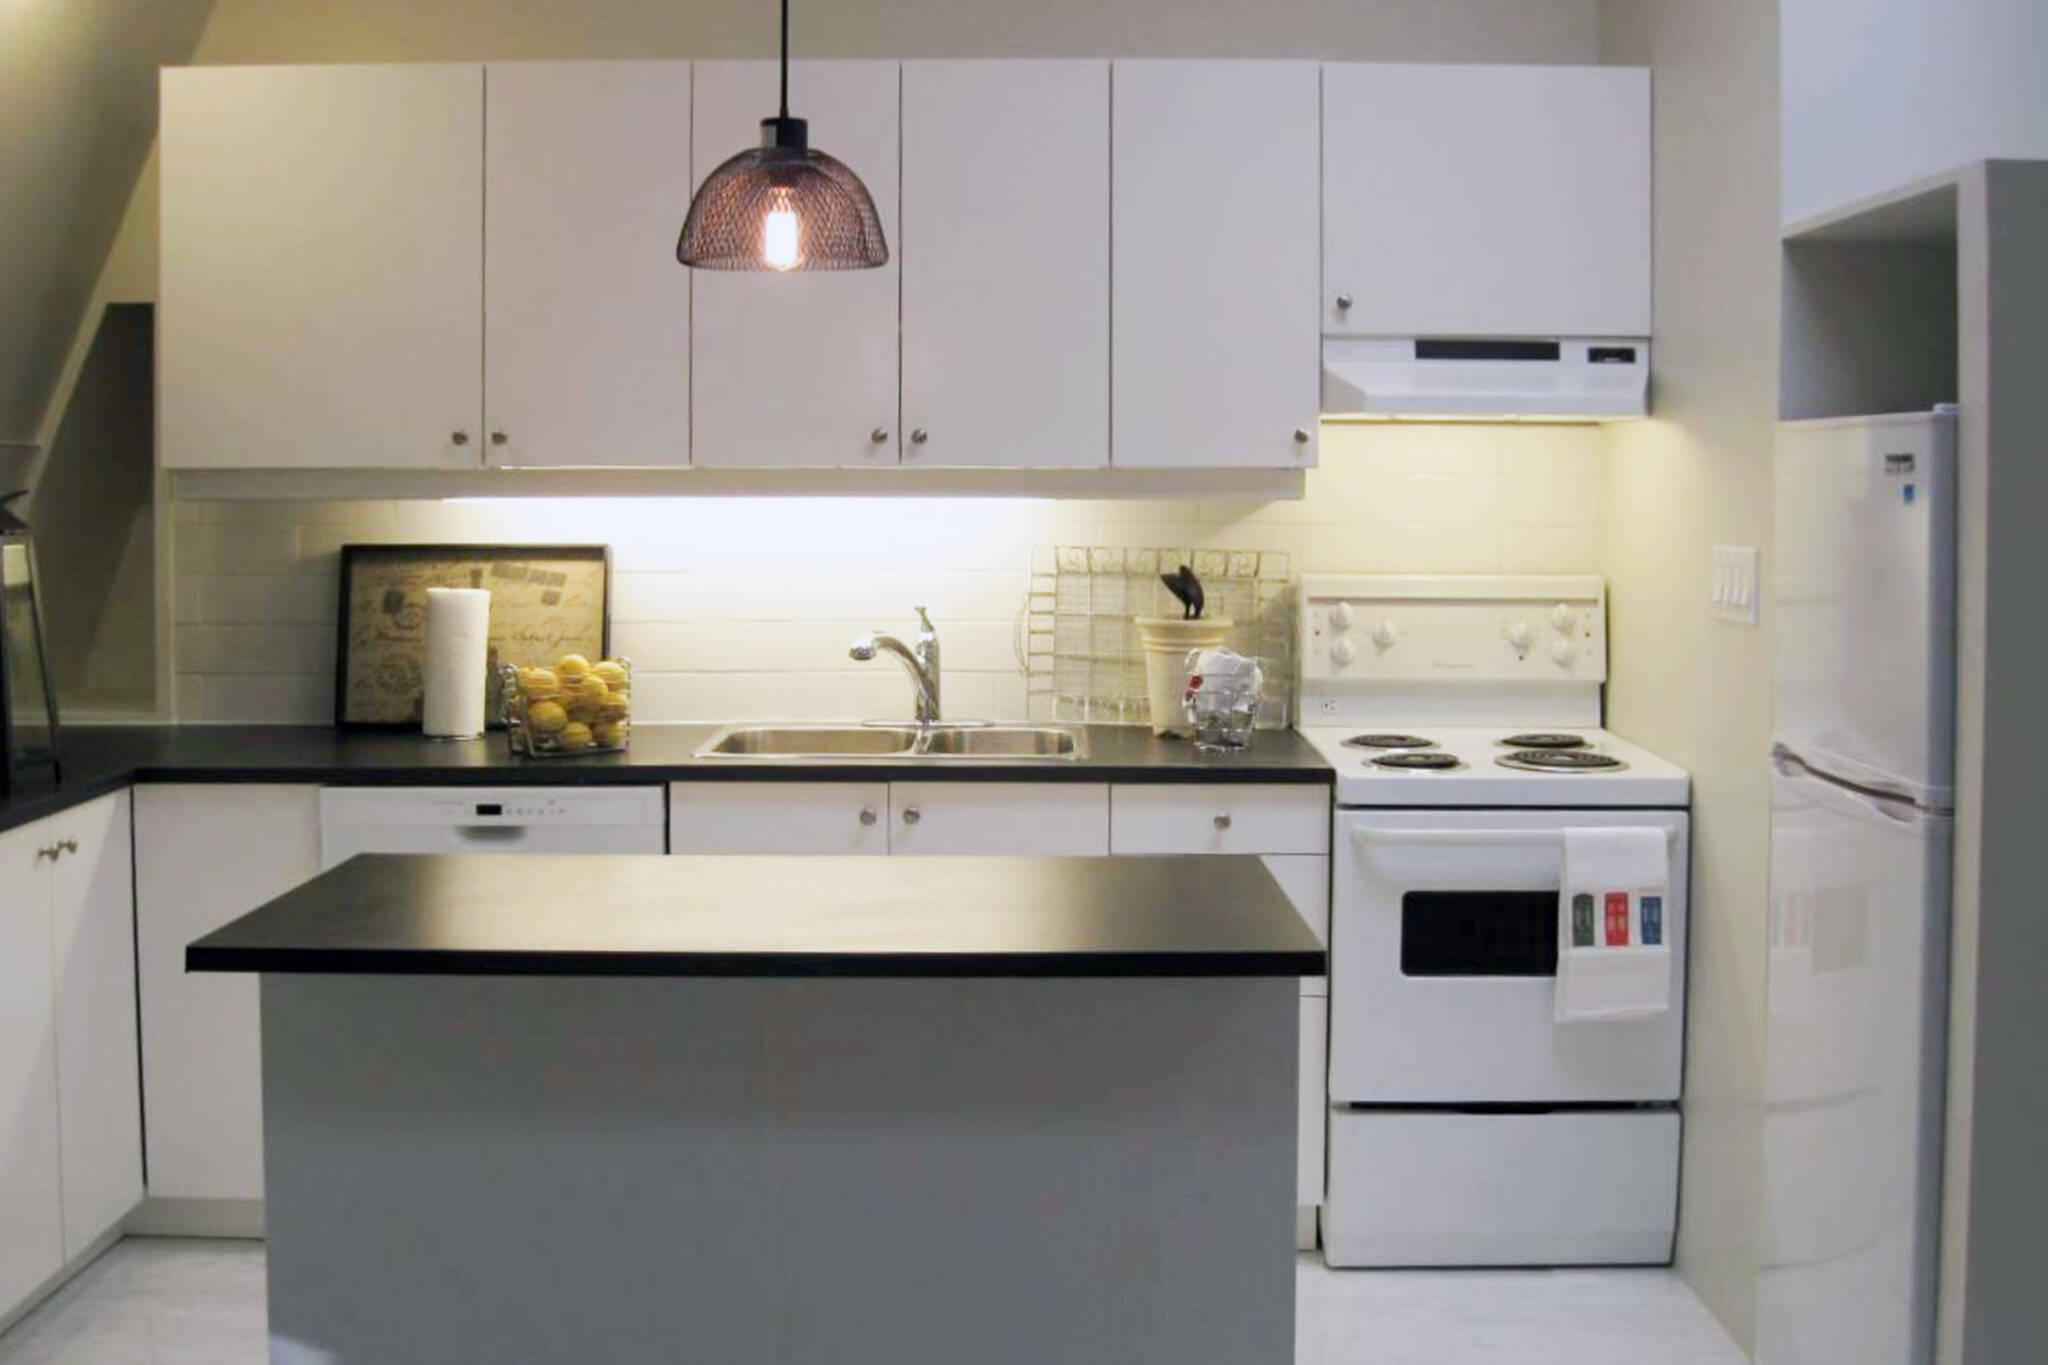 2000 apartments Toronto